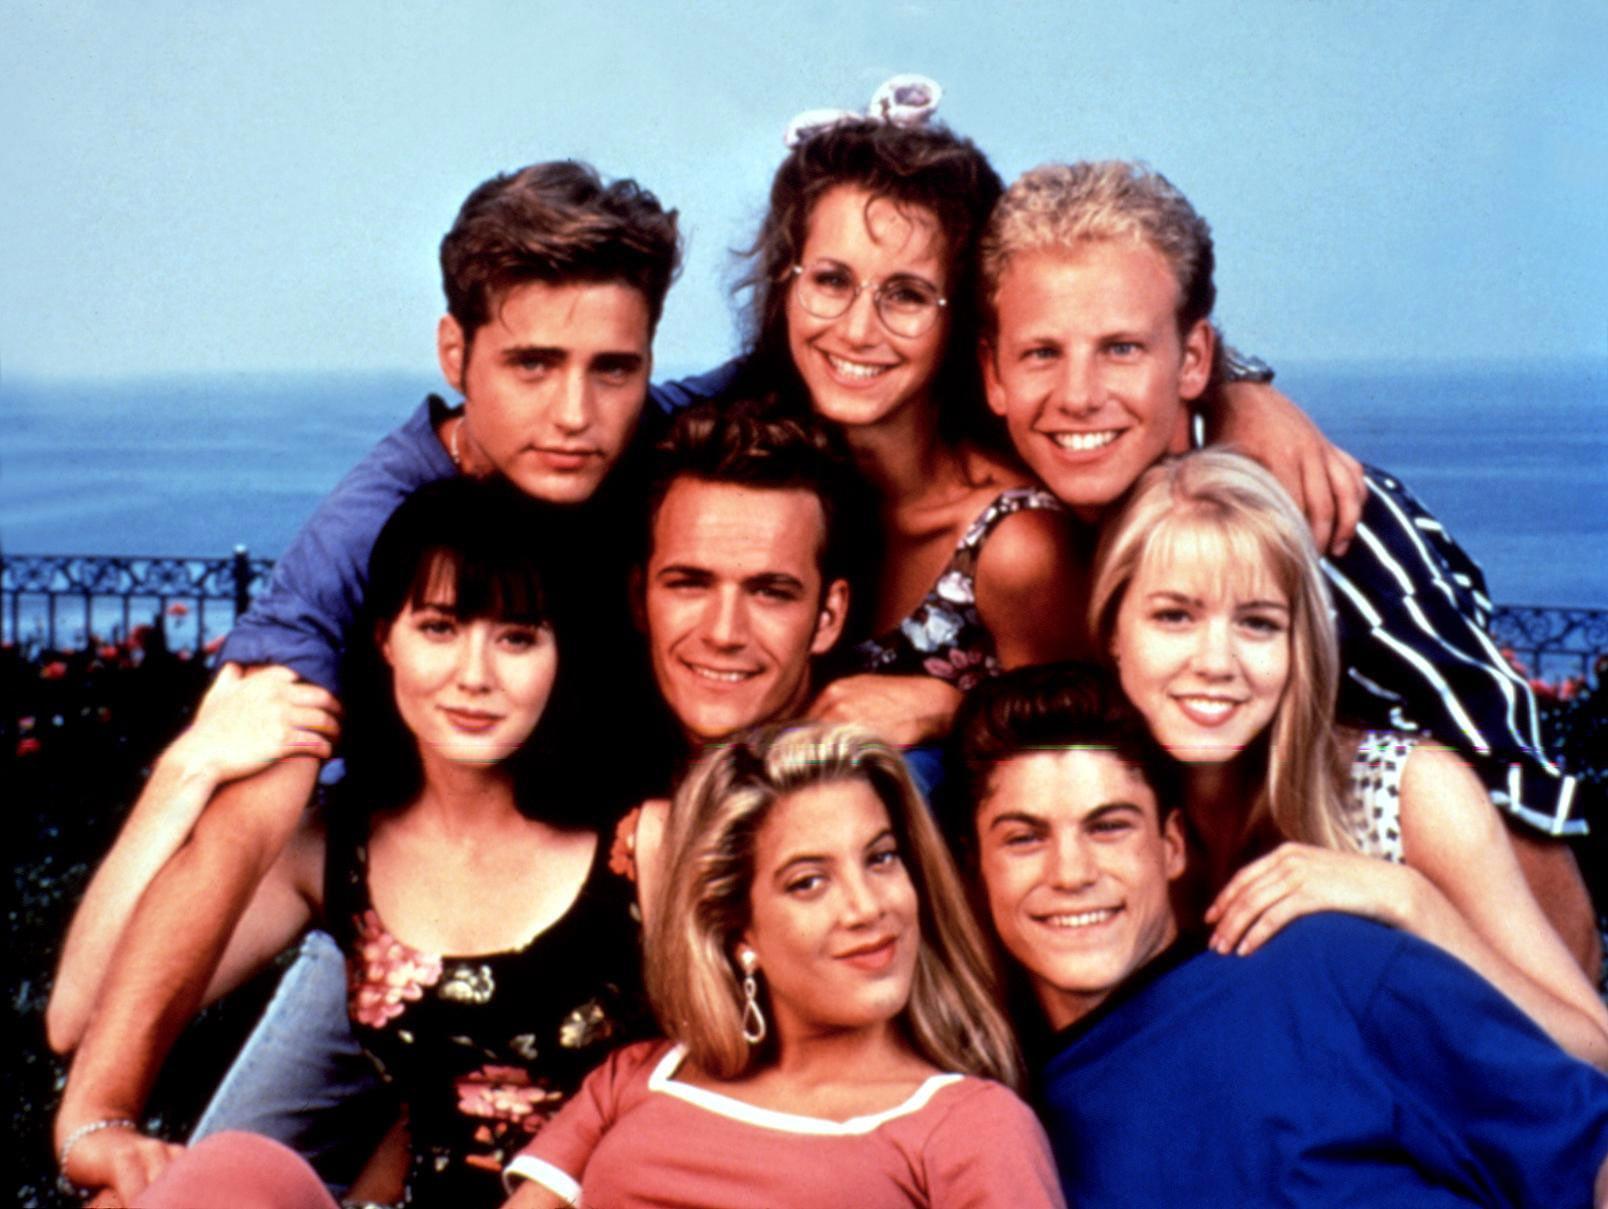 The original Beverly Hills, 90210 cast